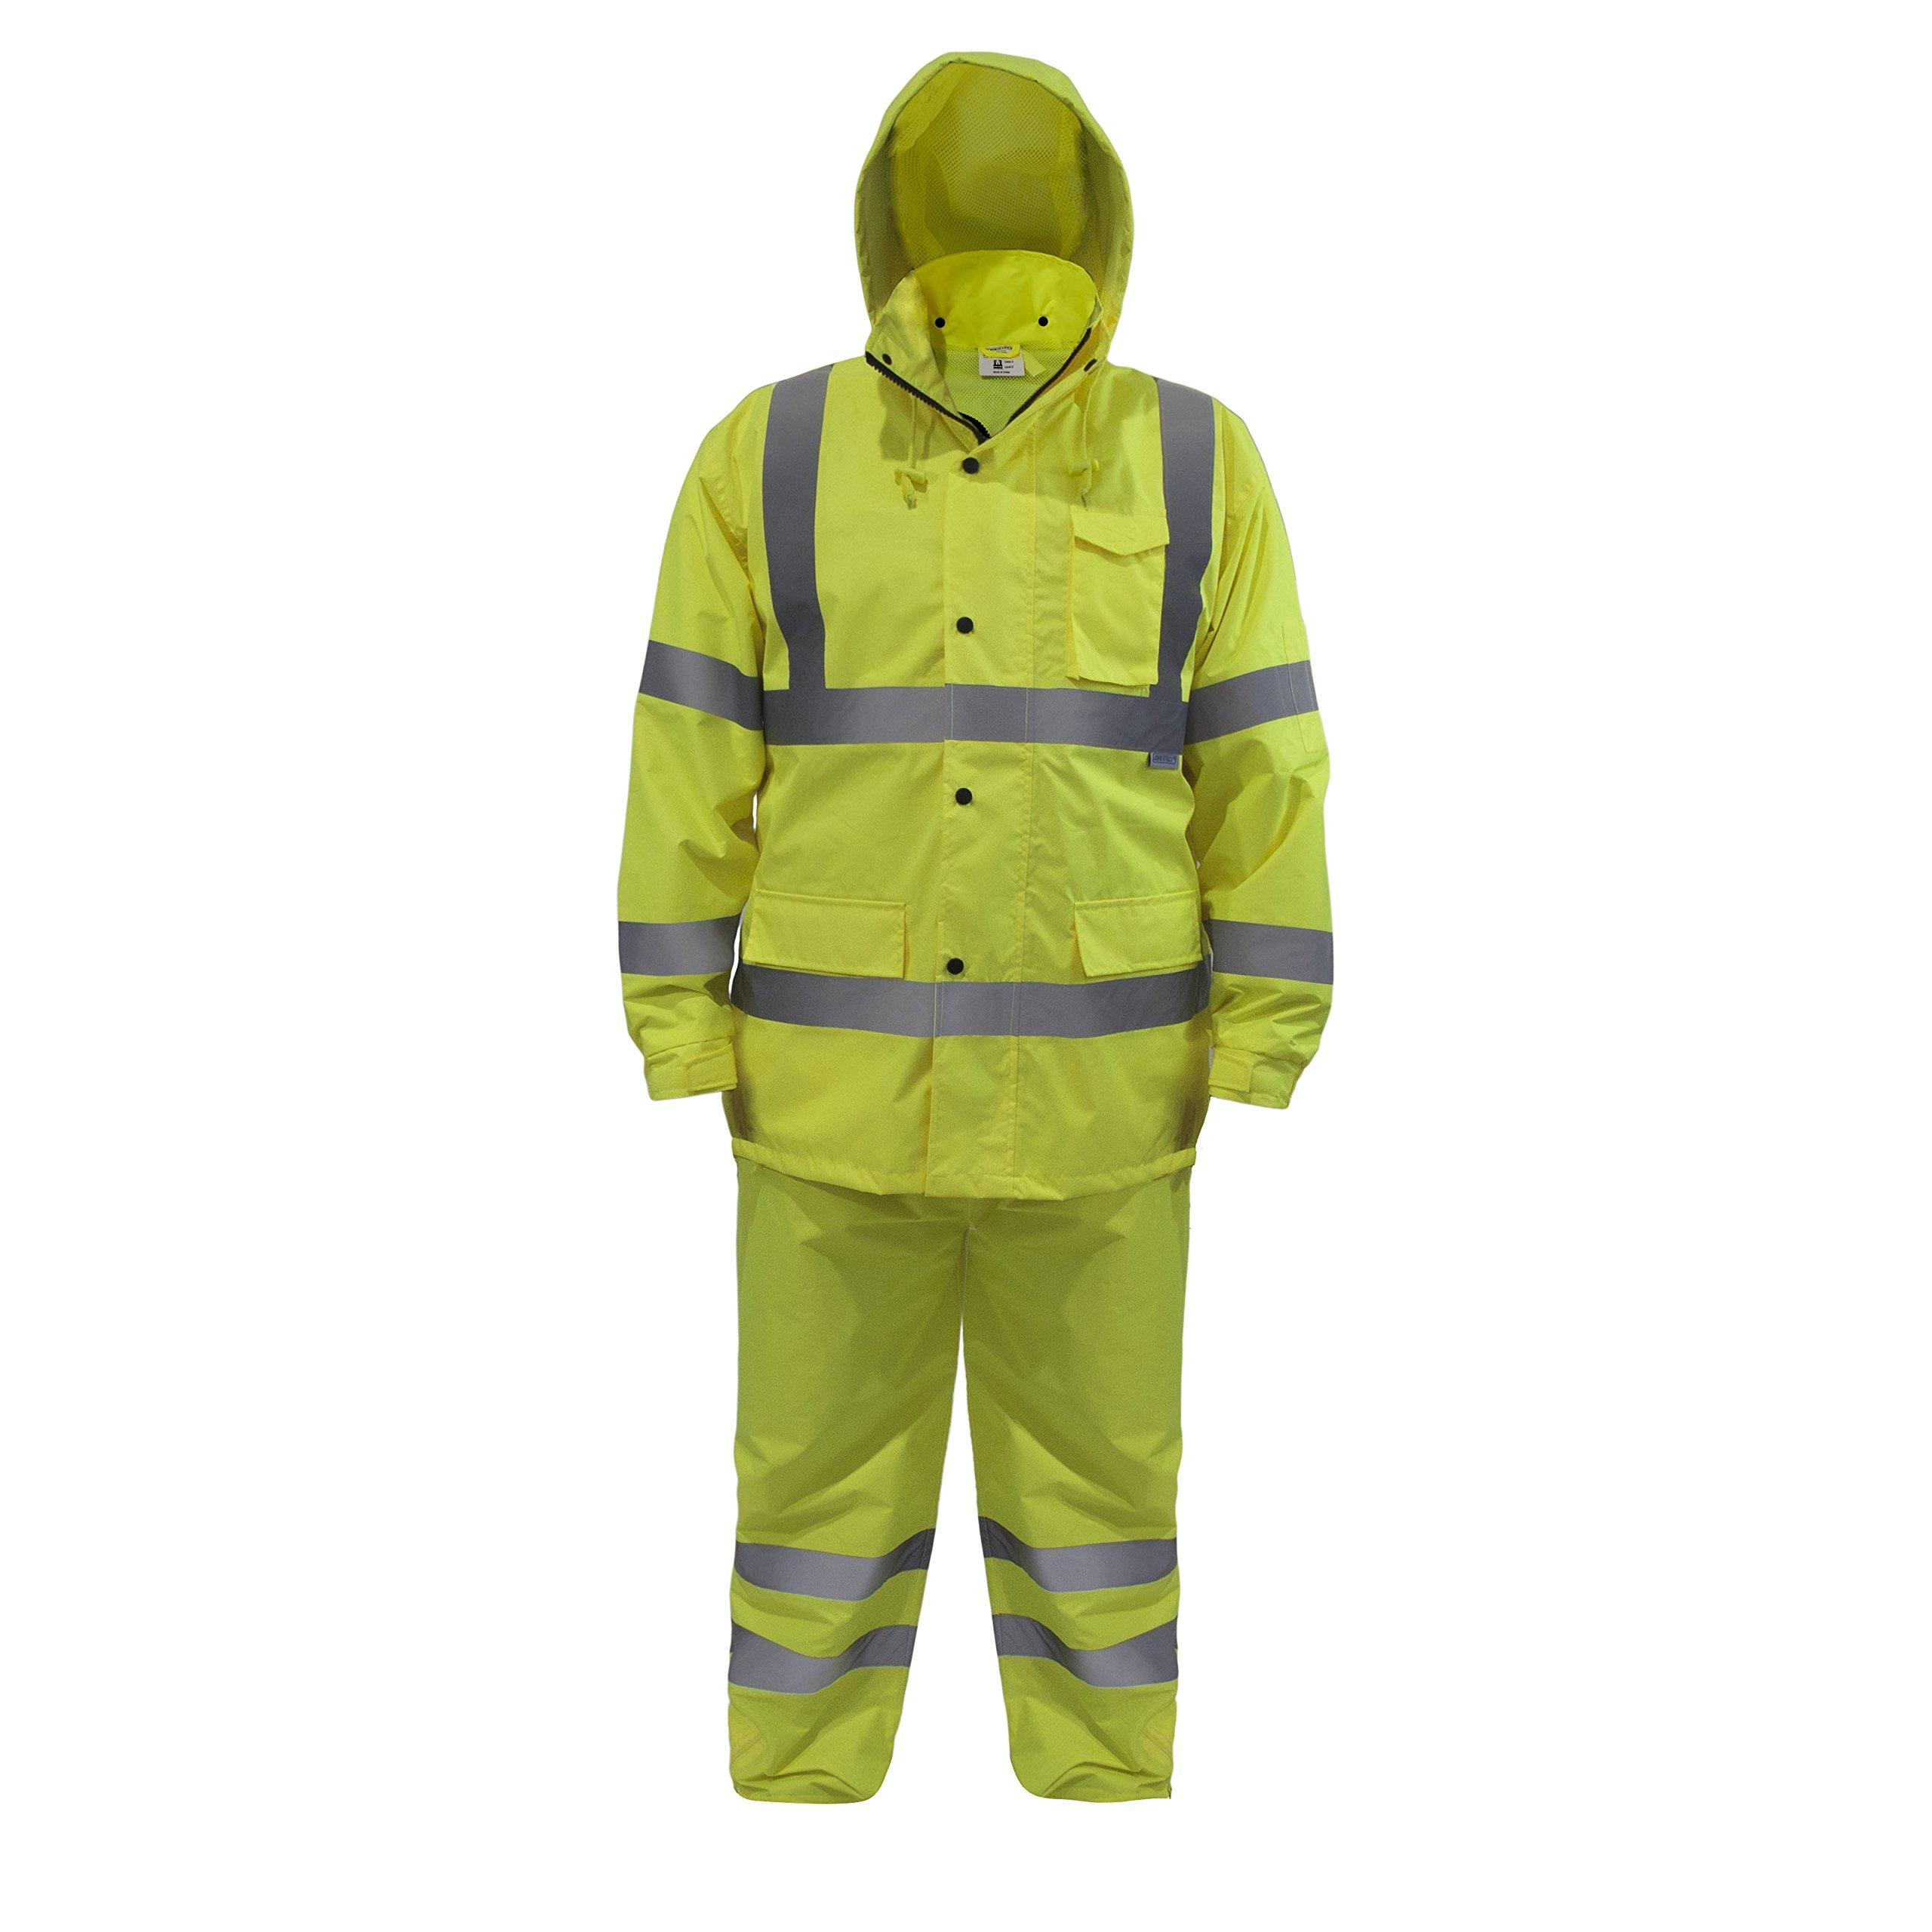 JORESTECH Light Weight Waterproof Rain Set Jacket and pants set High Visibility Yellow ANSI/ISEA 107-2015 Class 3 Level 2 (2X-Large)